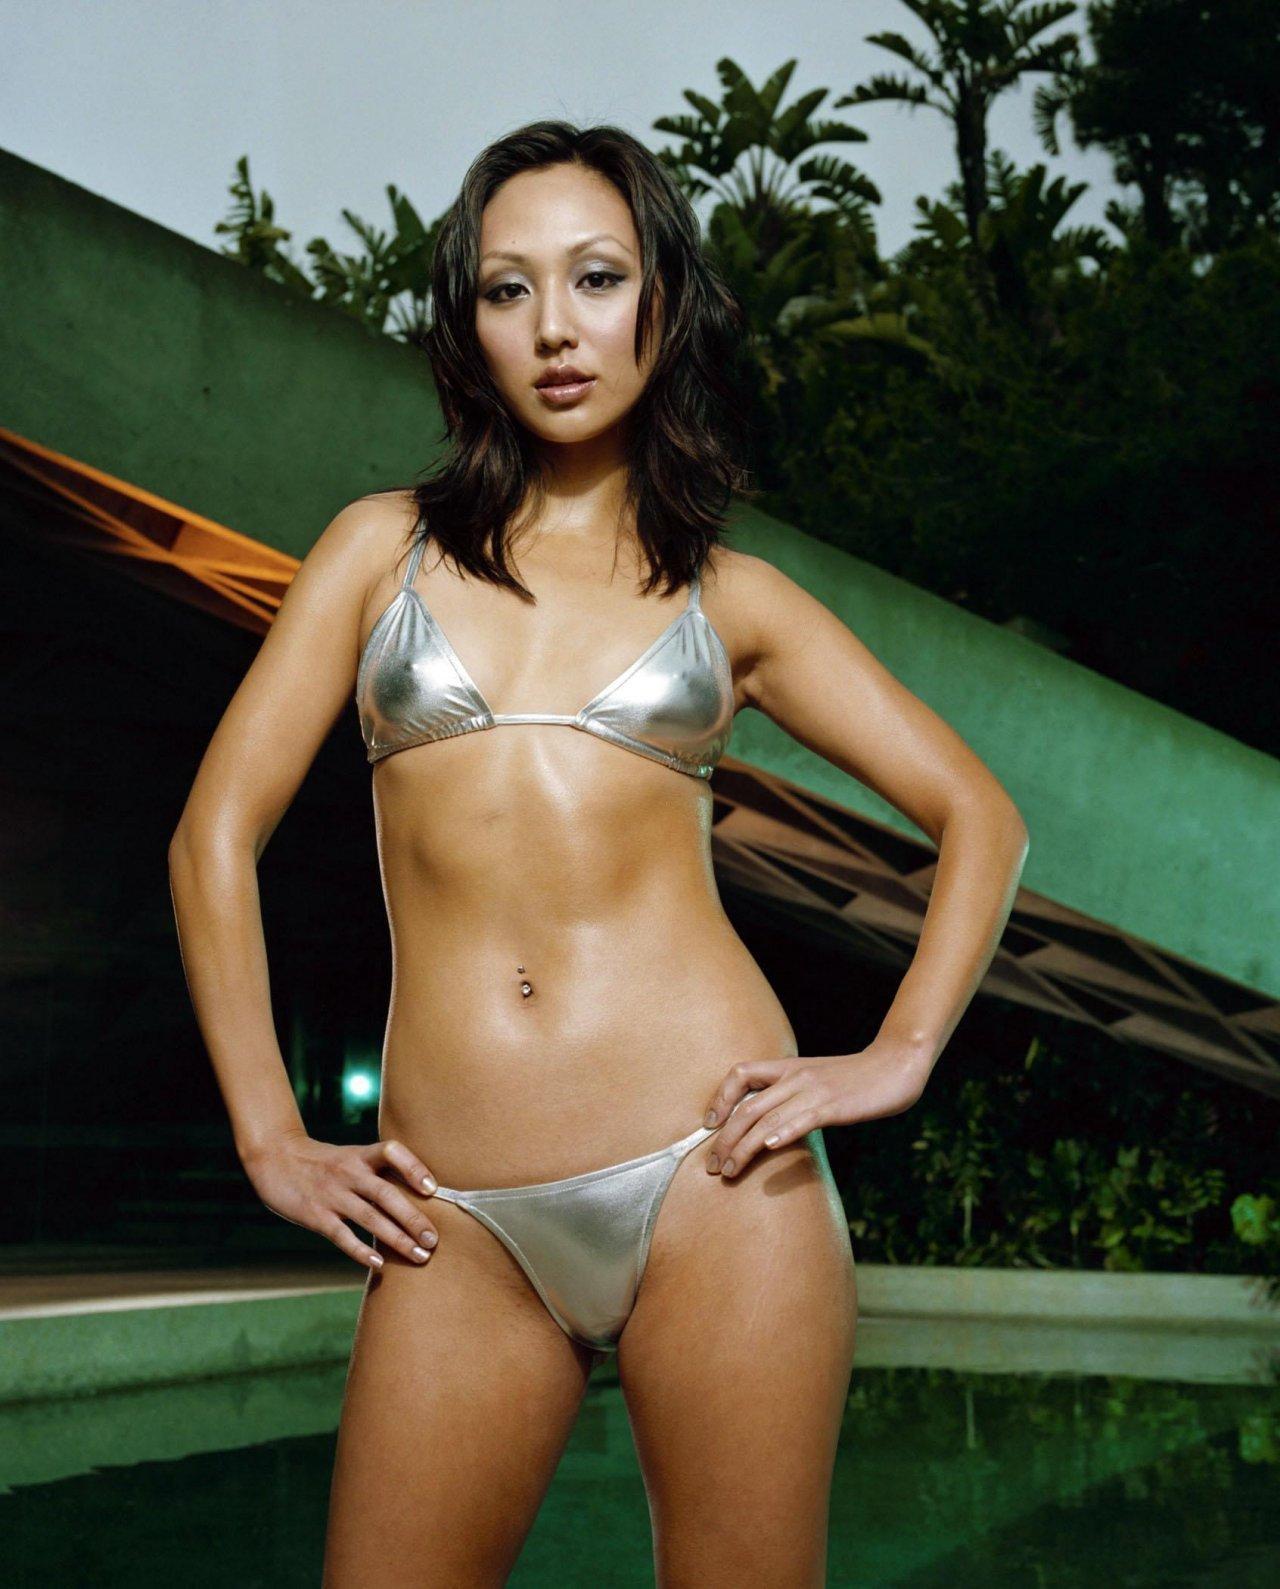 Amy Acker Bikini who would u rather - linda park vs amy acker